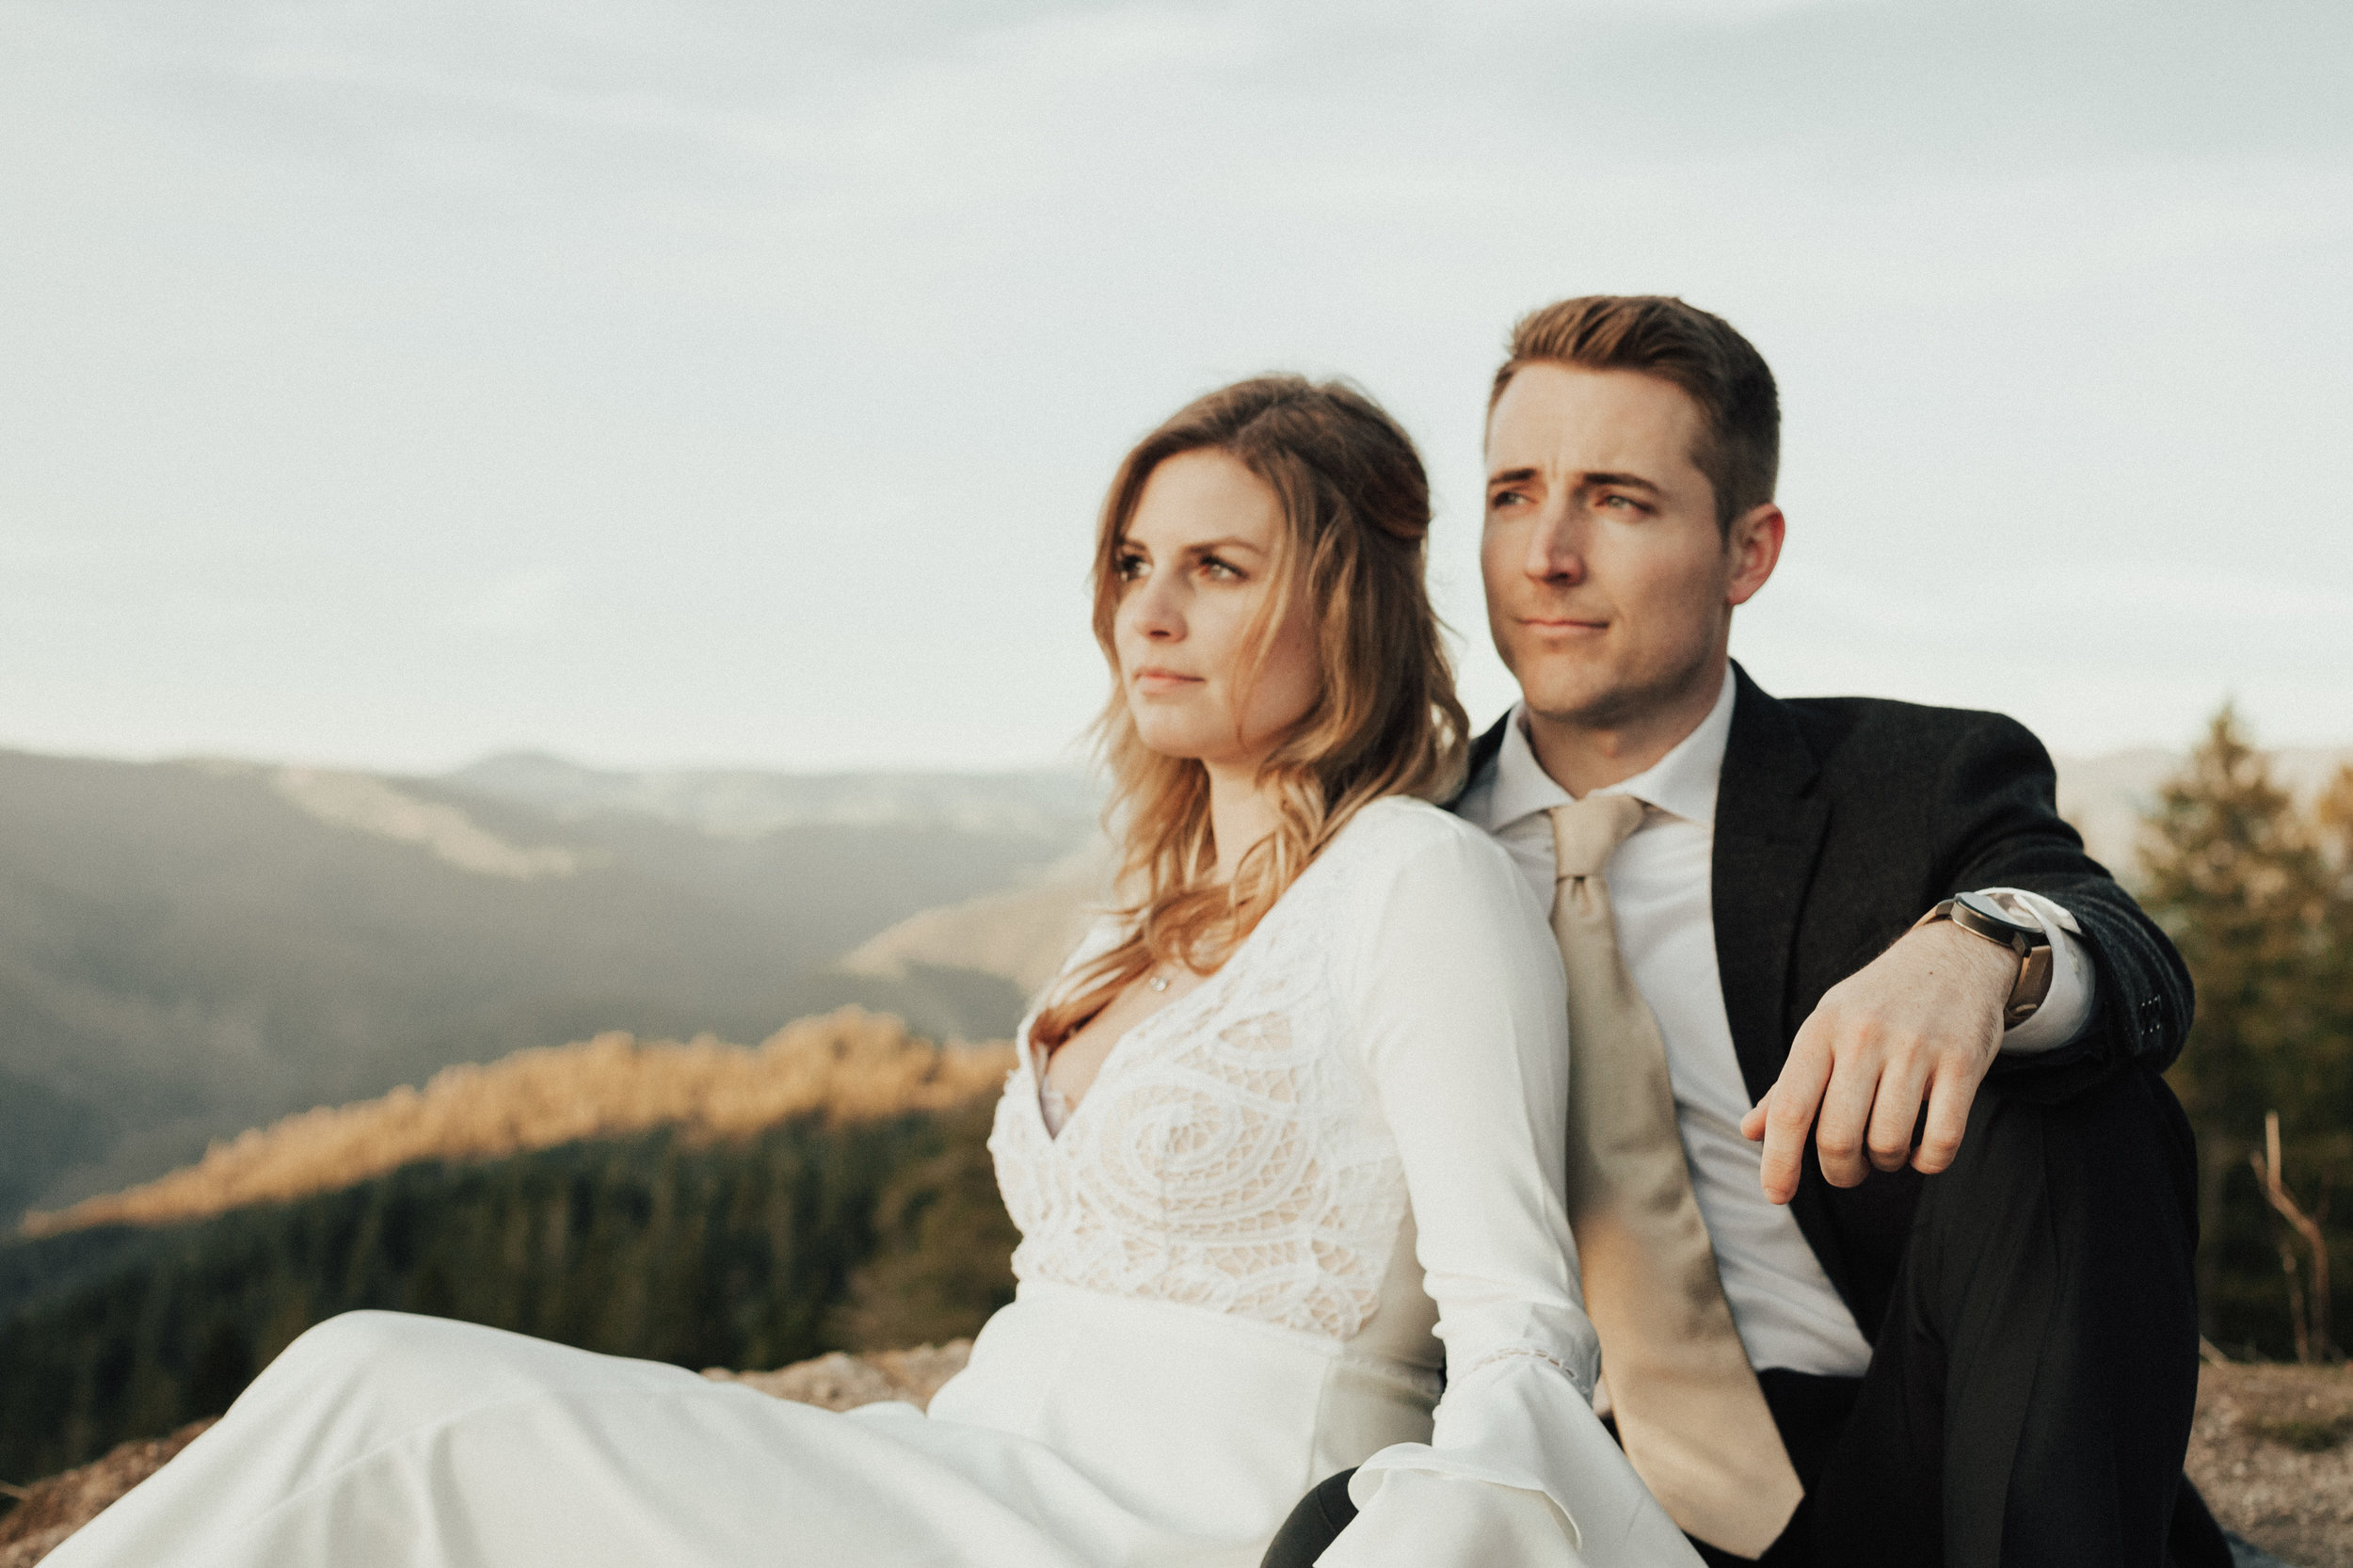 Intimate wedding photography in Sacramento